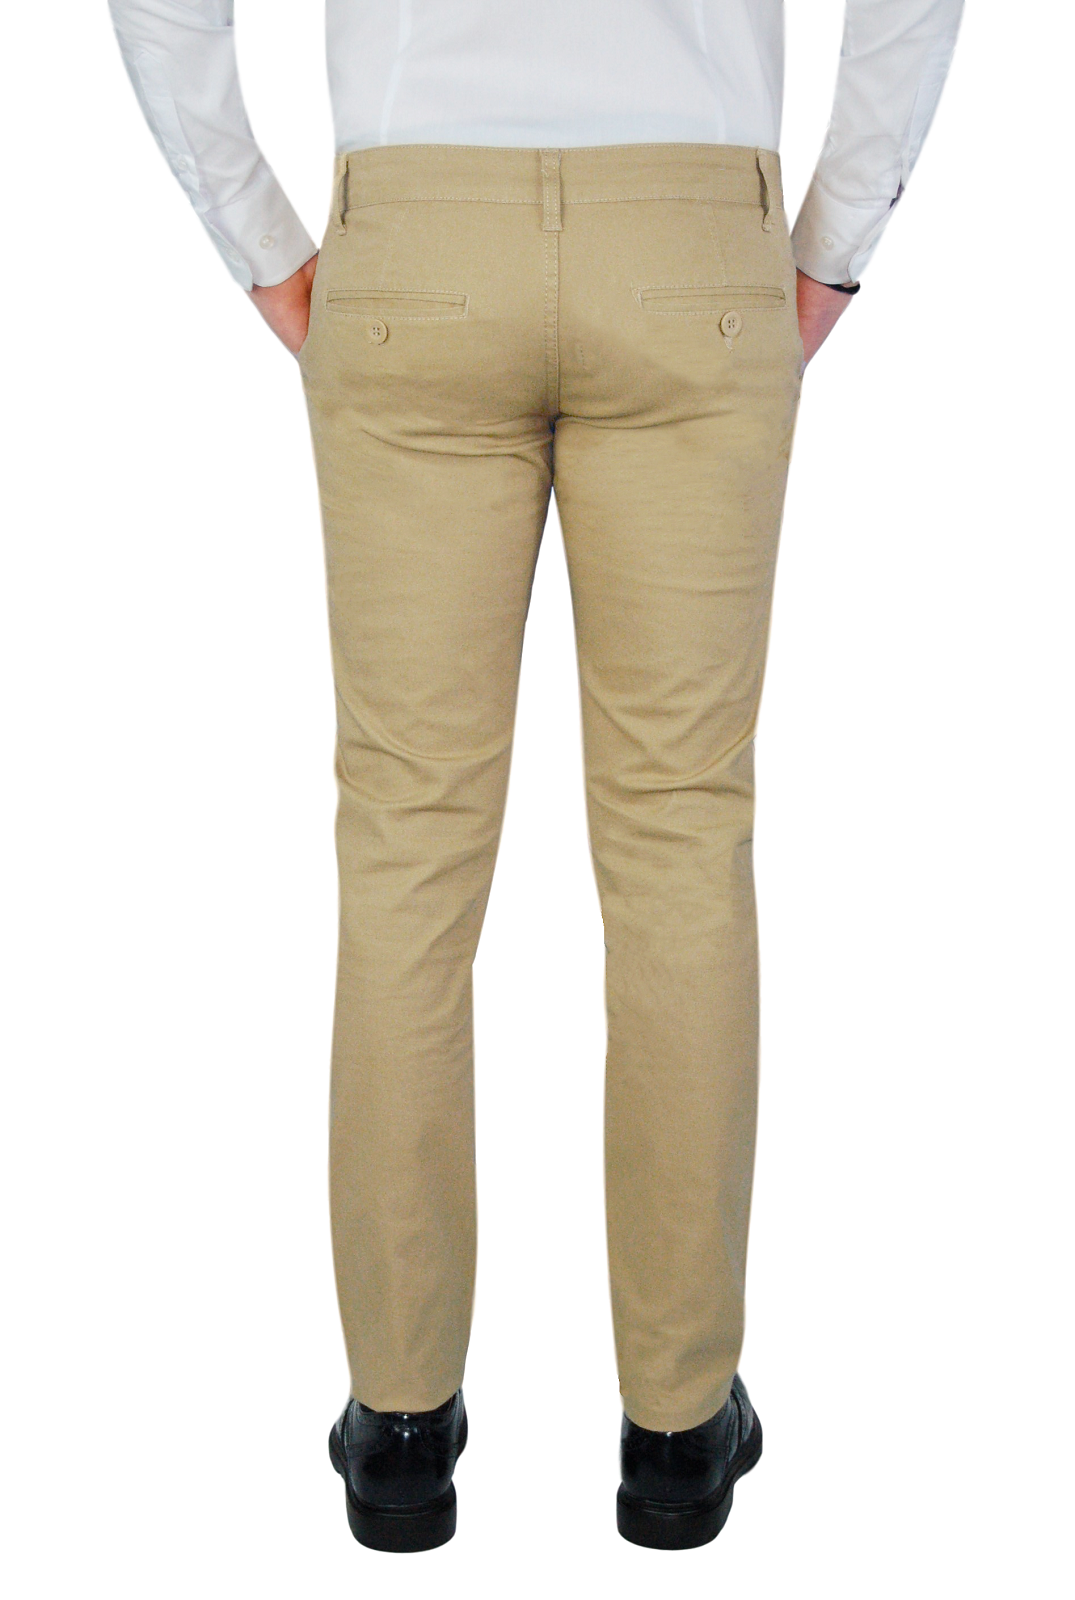 Pantalone-Uomo-Chino-Slim-fit-Primaverile-tasca-america-Bianco-Grigio-Senape-Bei miniatura 27